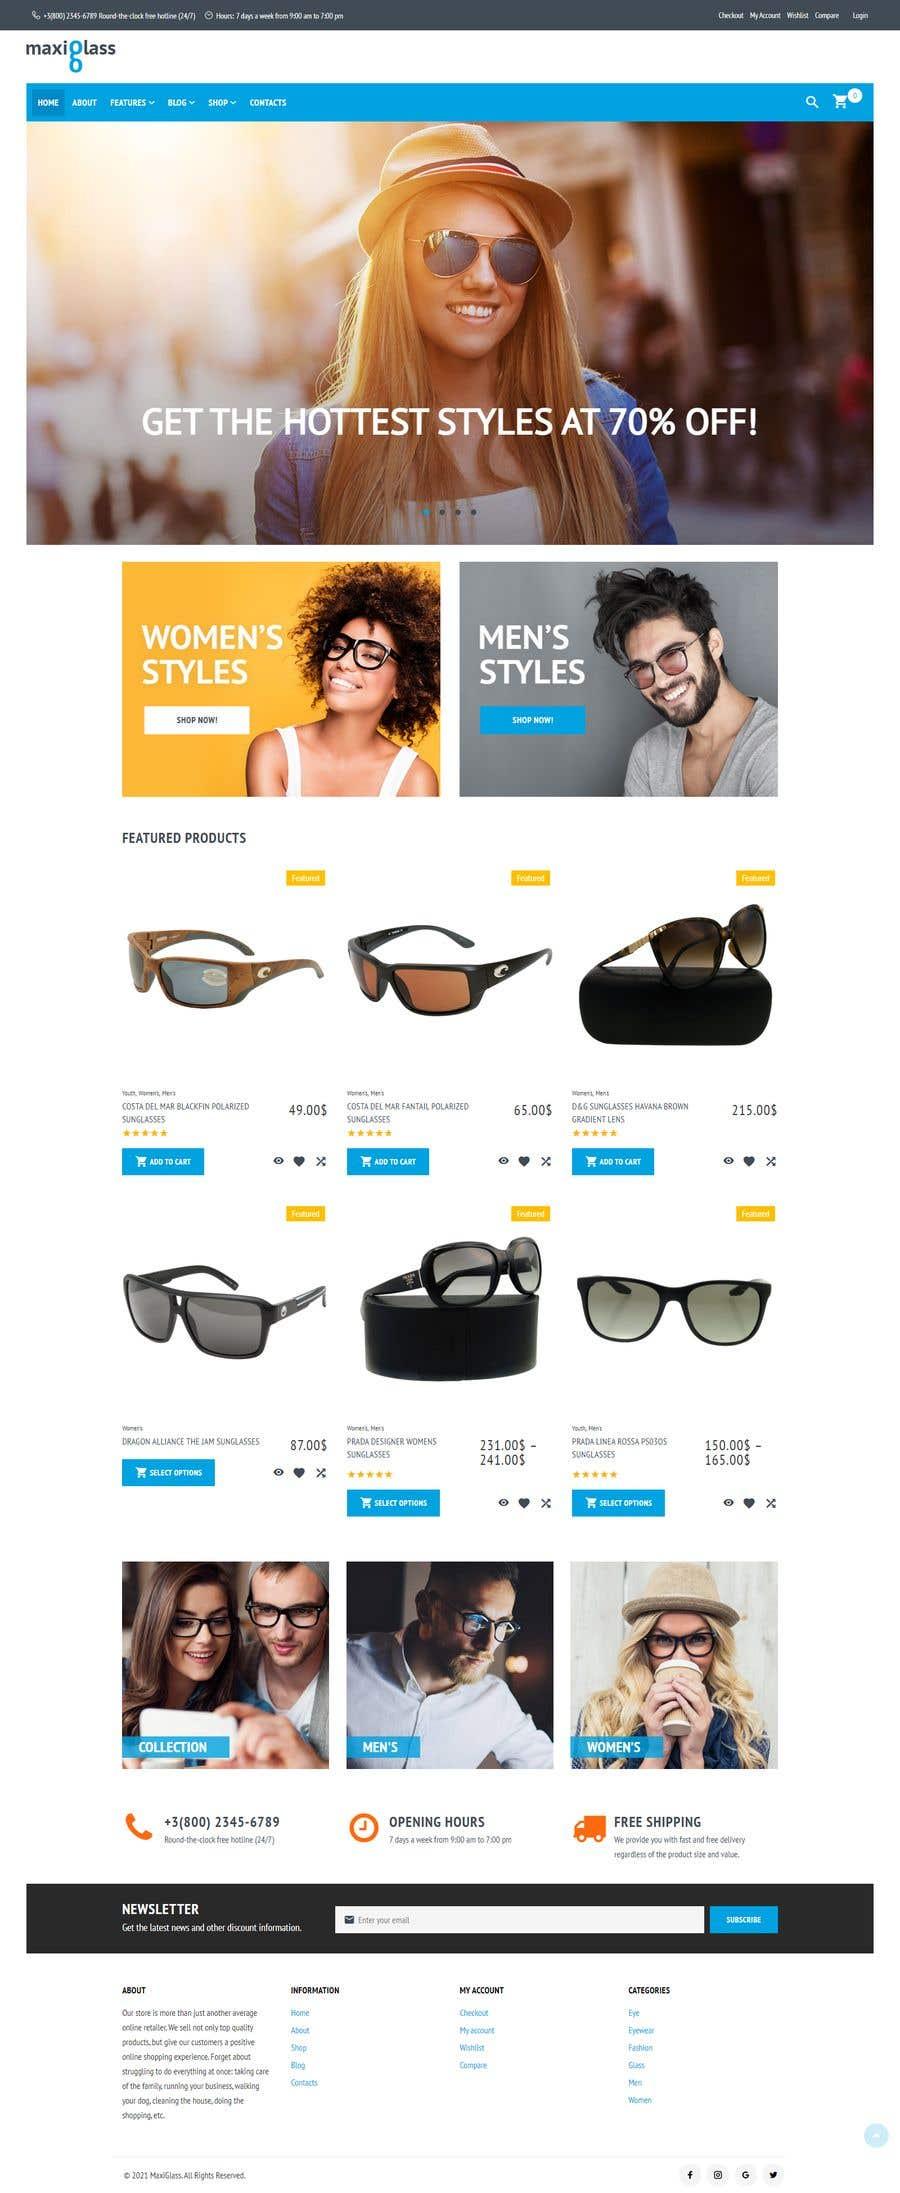 Konkurrenceindlæg #                                        45                                      for                                         Design an online shopping page for my website